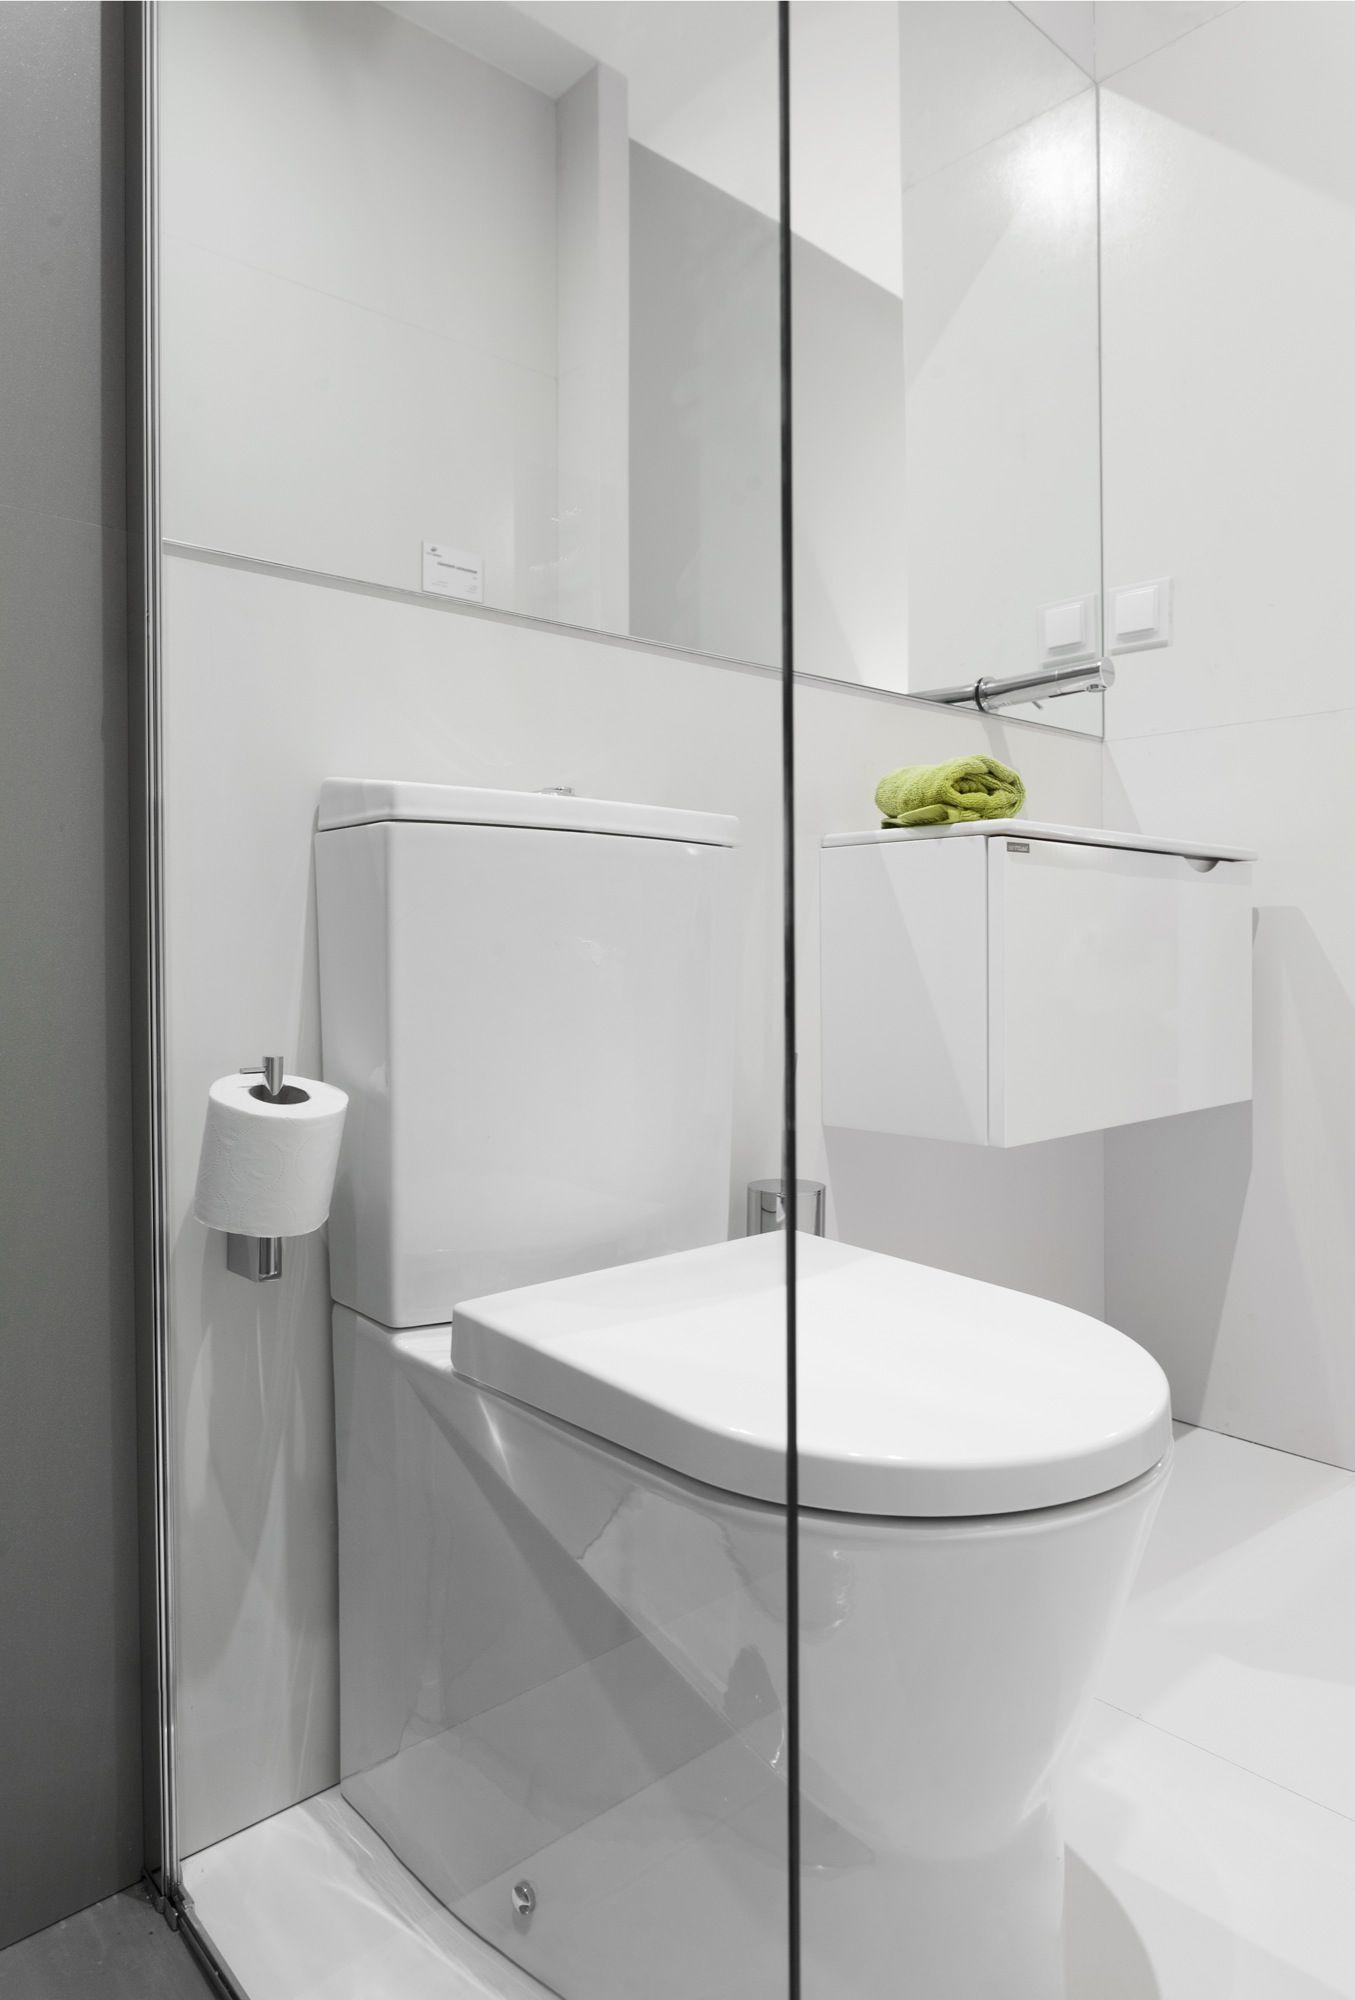 Narrow bathroom with Sanindusa products Small toilet